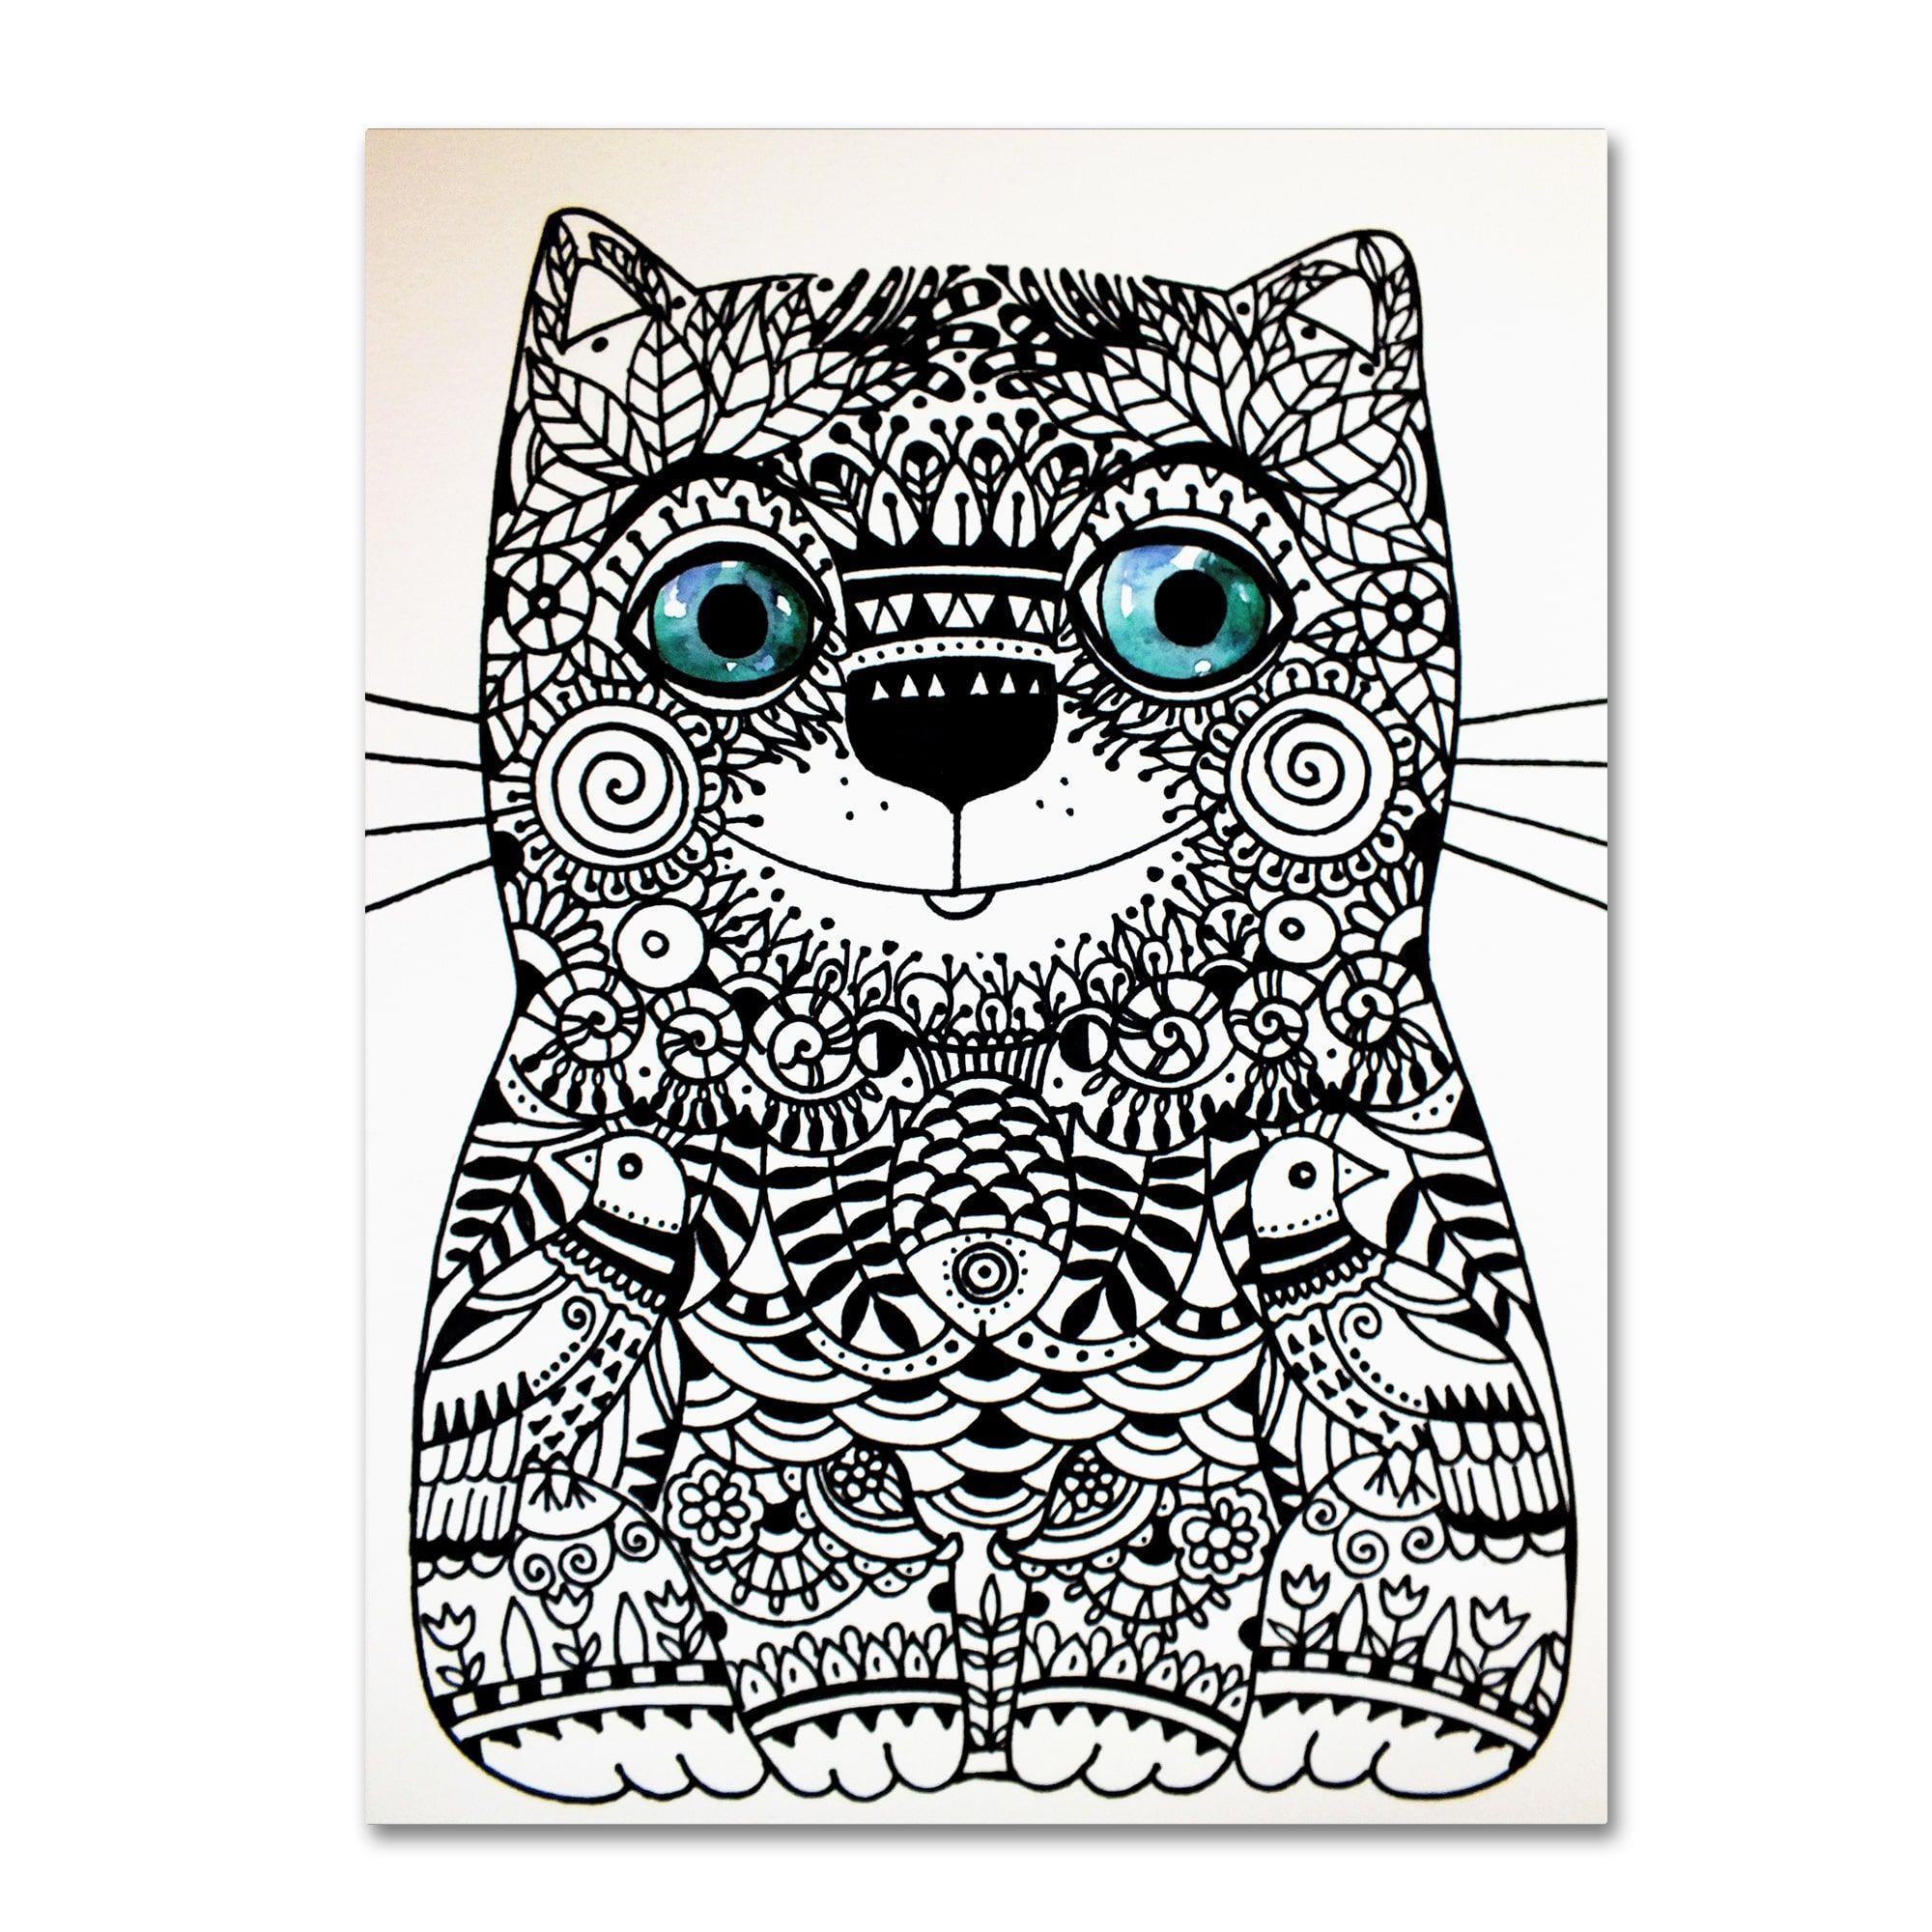 Oxana ziaka uhappy catu canvas art products pinterest canvases